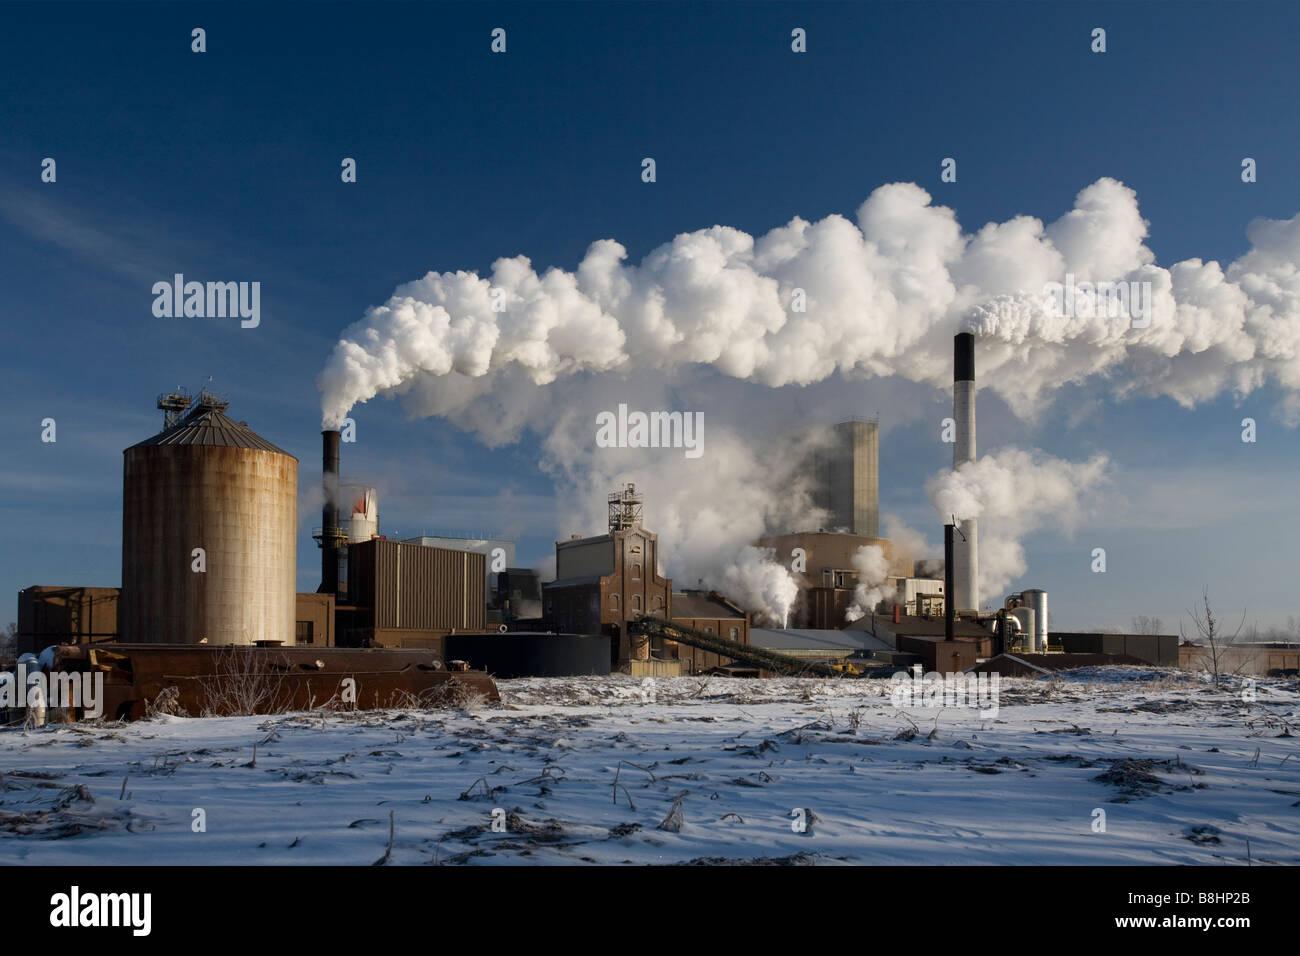 Sugar Refinery - Stock Image